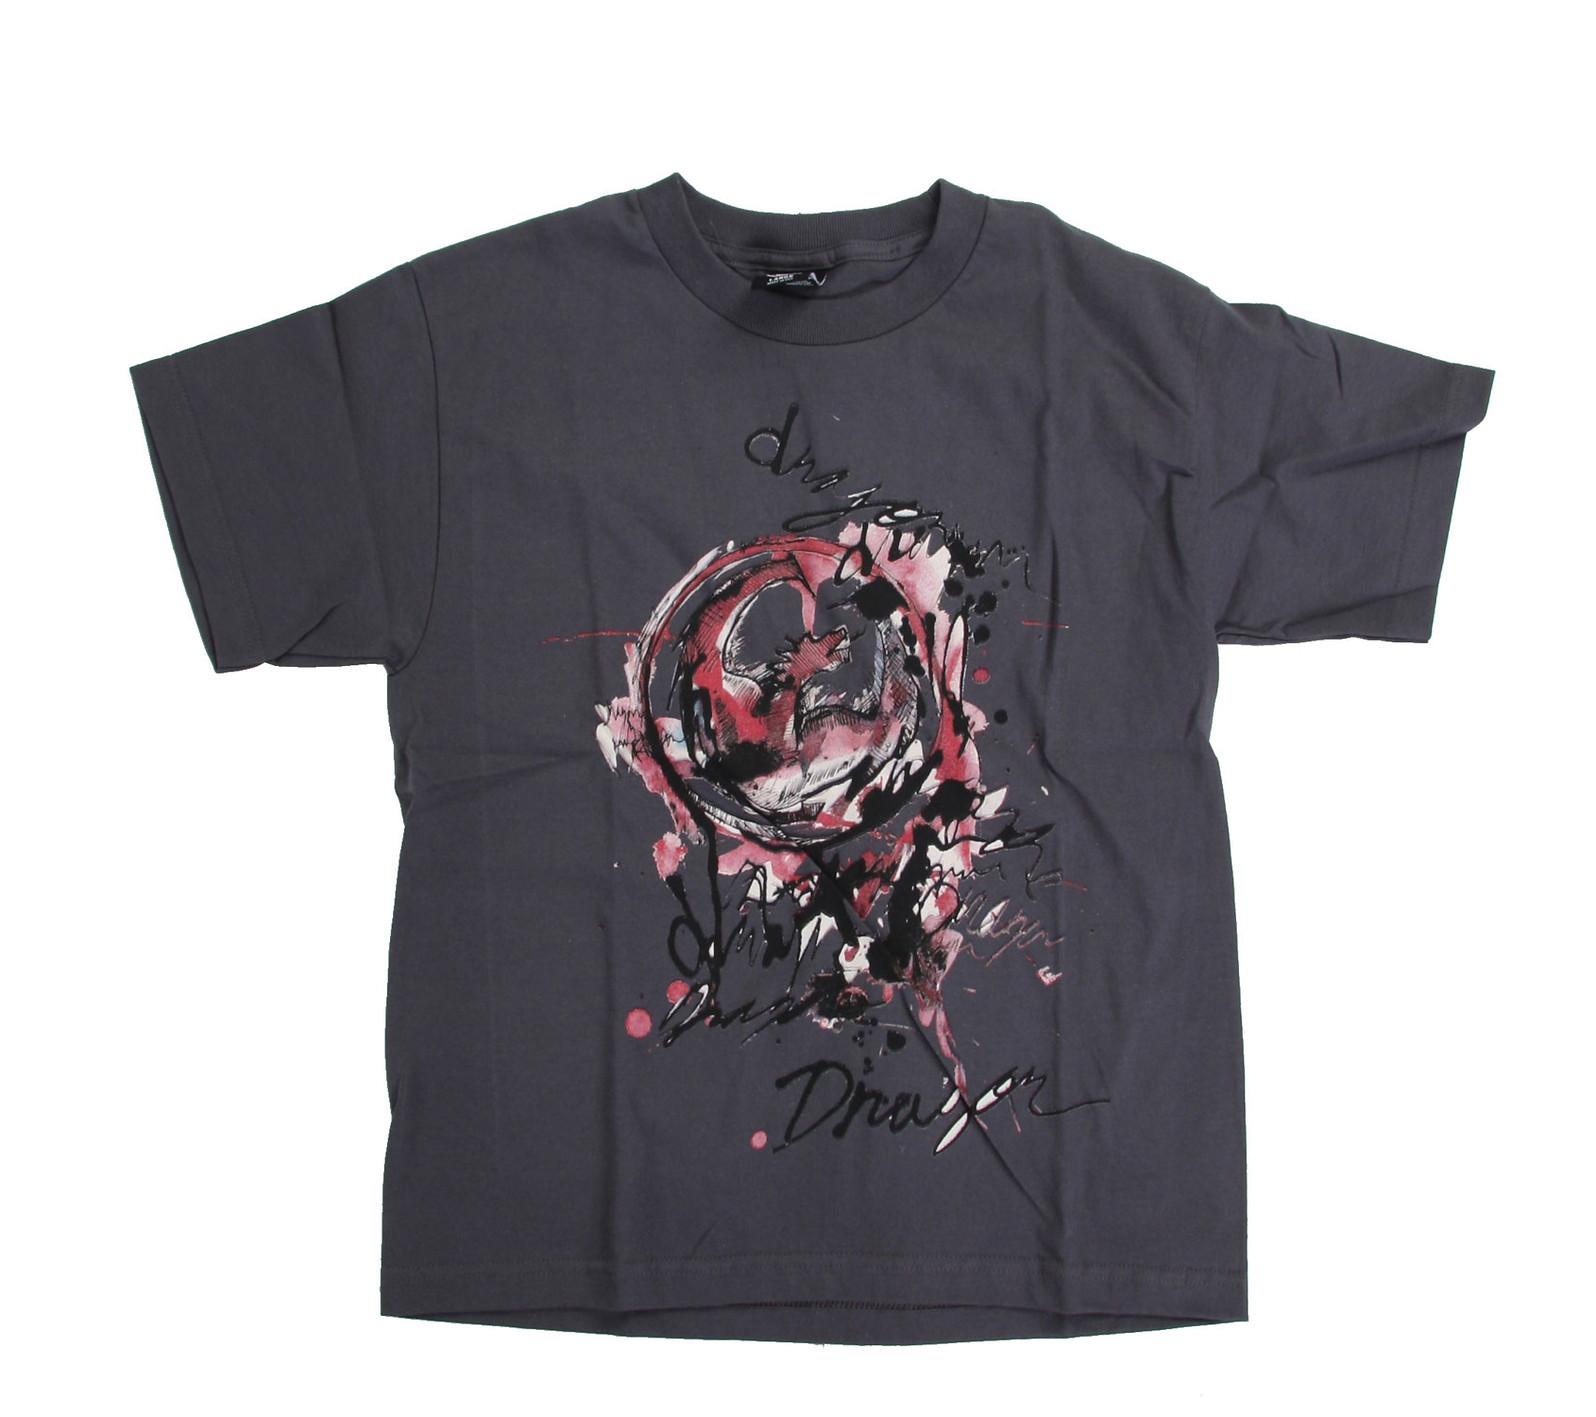 Dragon Washed Out T-Shirt Charcoal  dragon-washedout-t-yth-chrcl-10.jpg